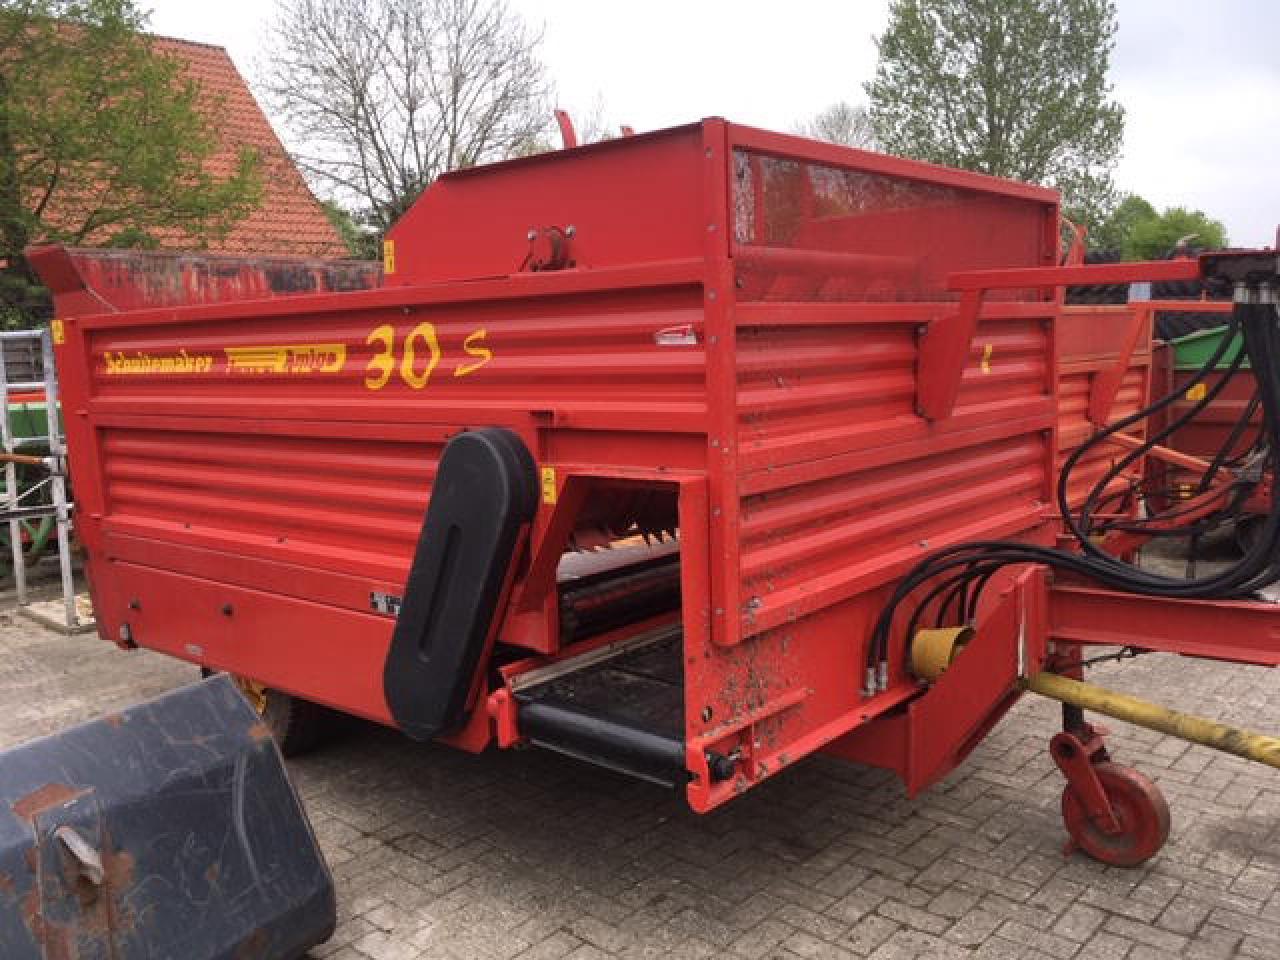 Schuitemaker SR Holland AMIGO 30S